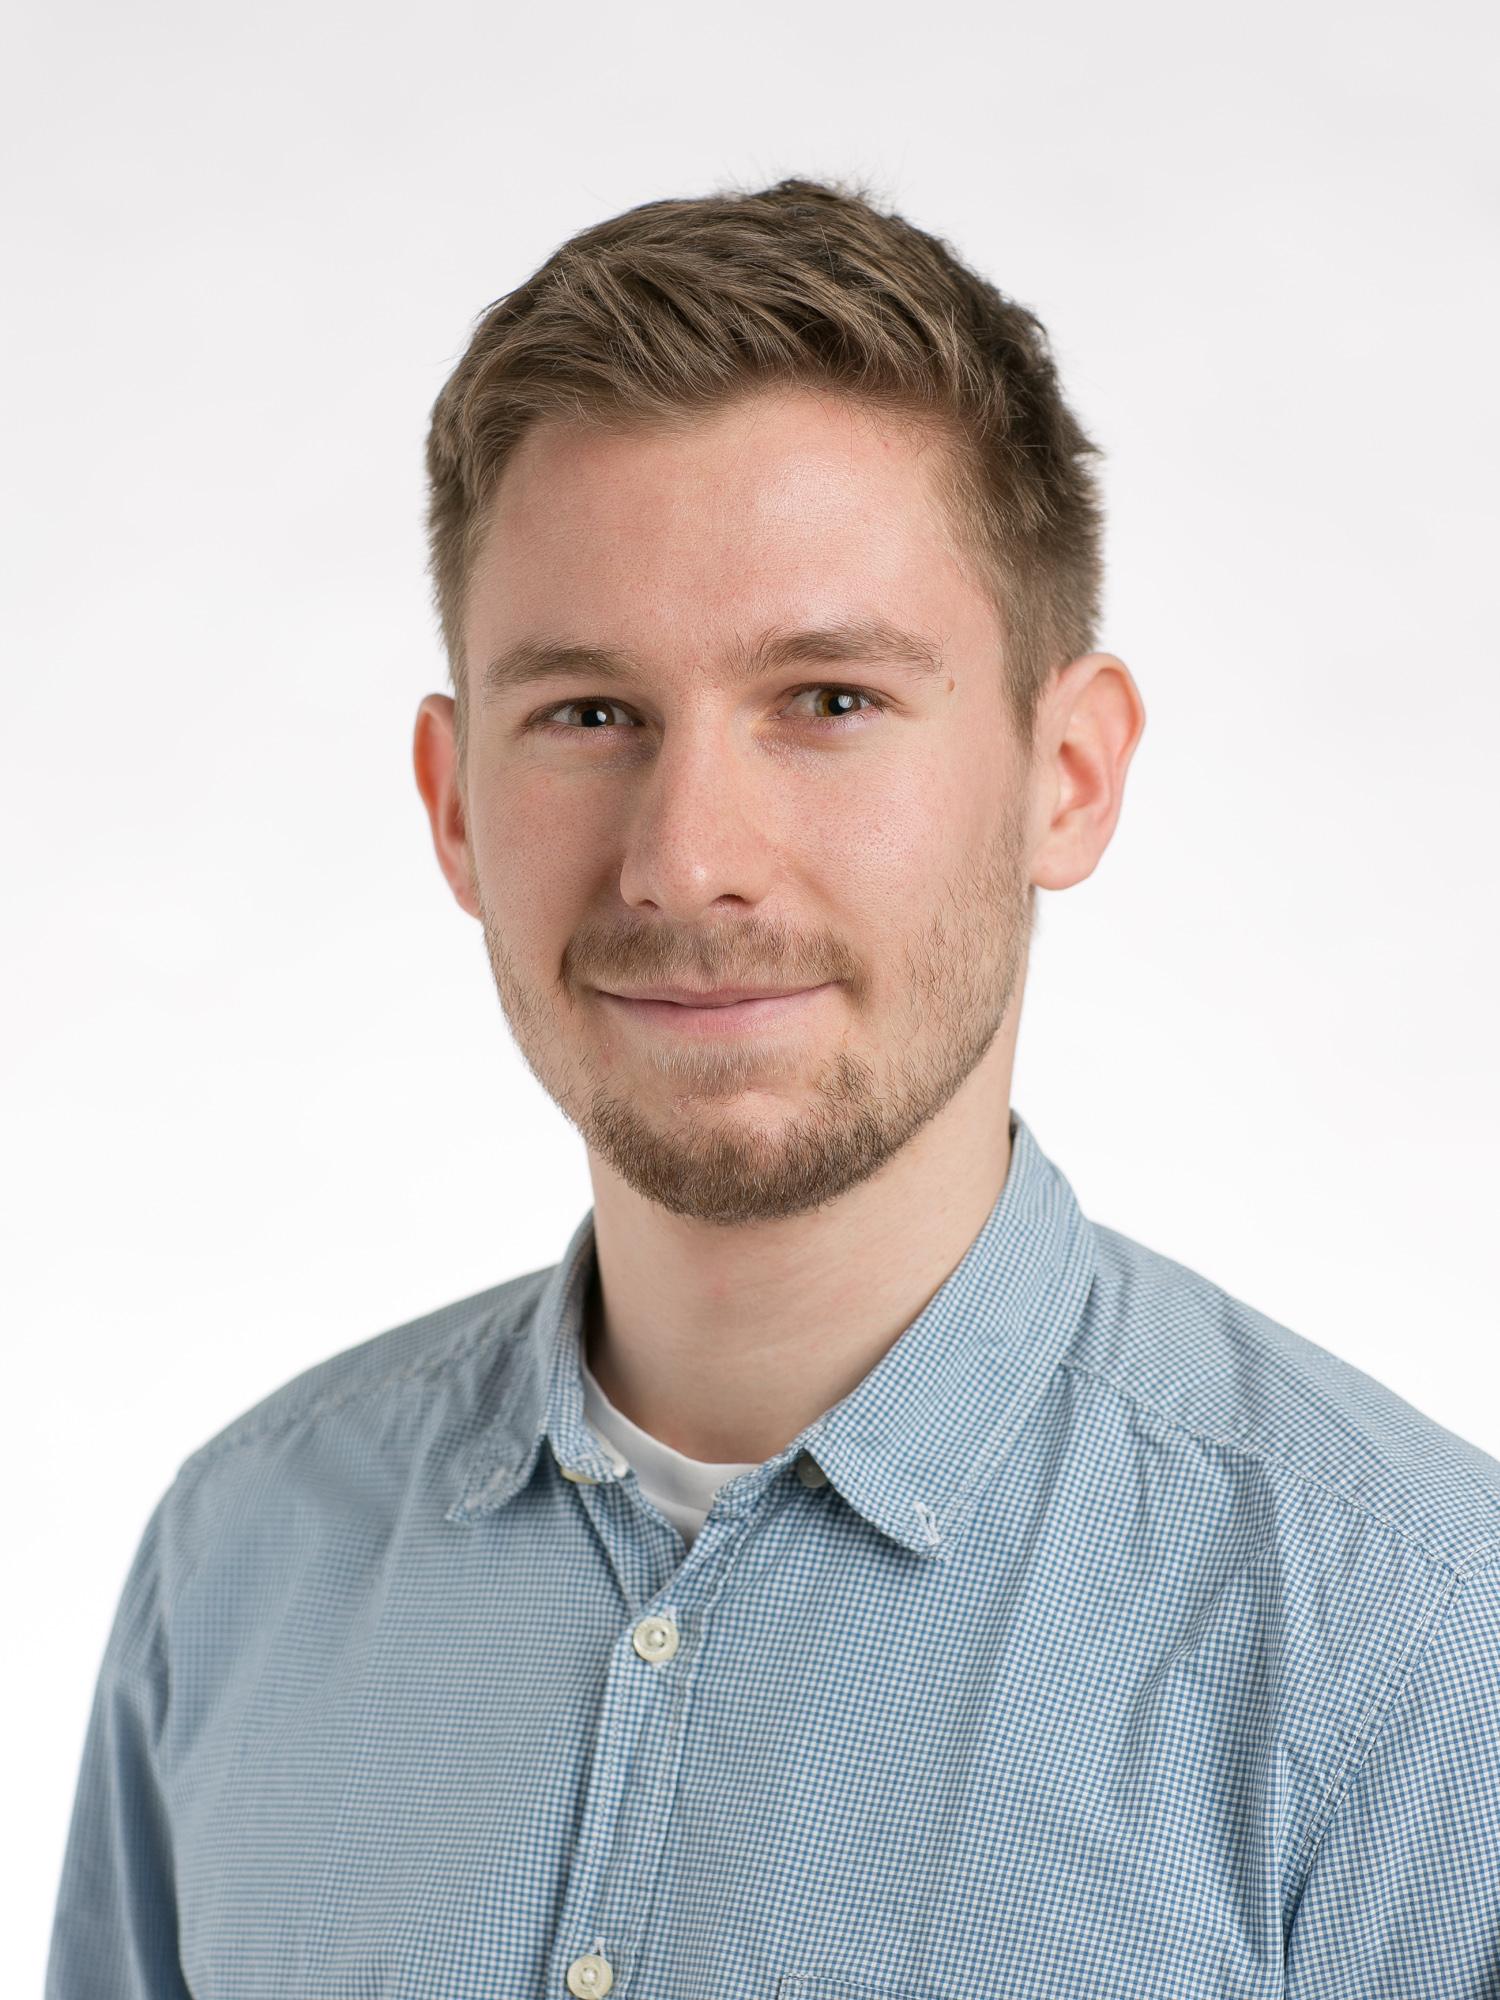 Rafael Daetwyler, Backend Engineering Intern